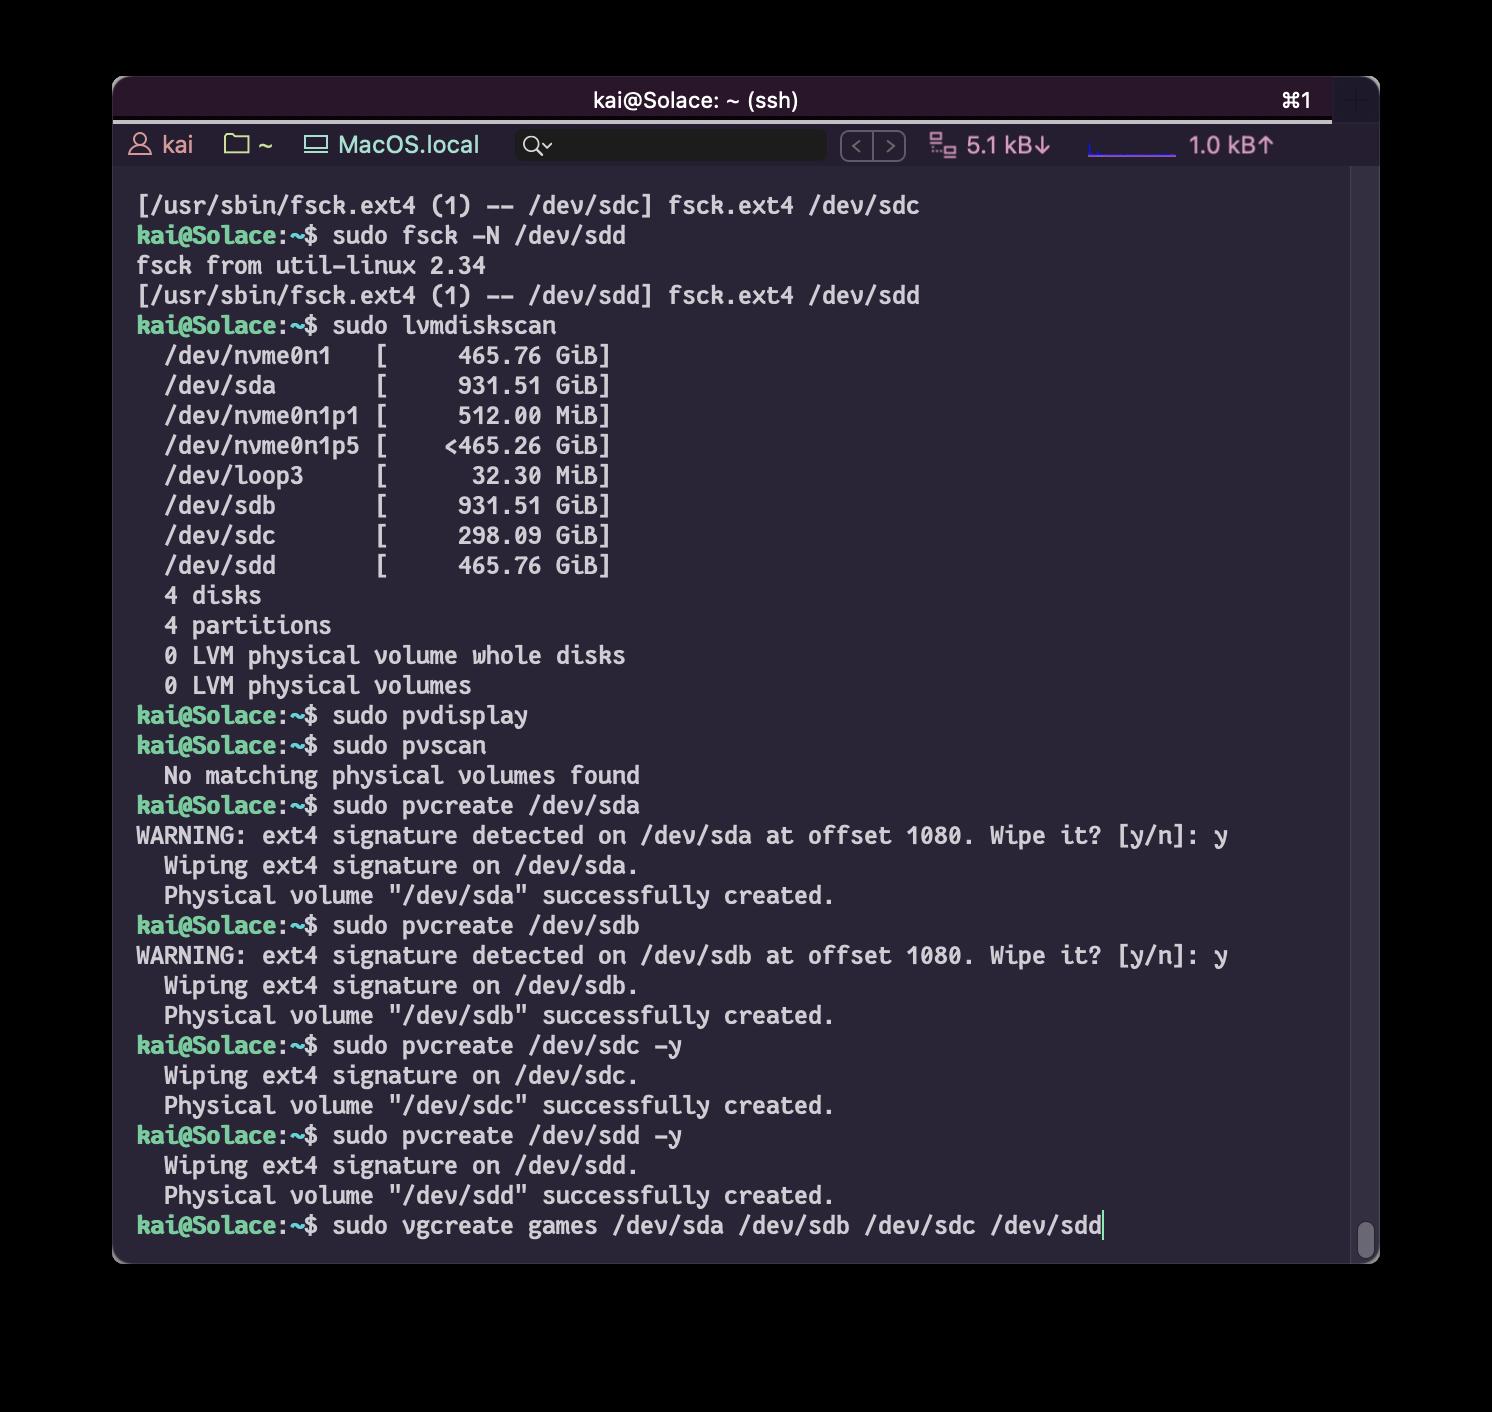 https://cloud-oq4buvfum-hack-club-bot.vercel.app/0image.png